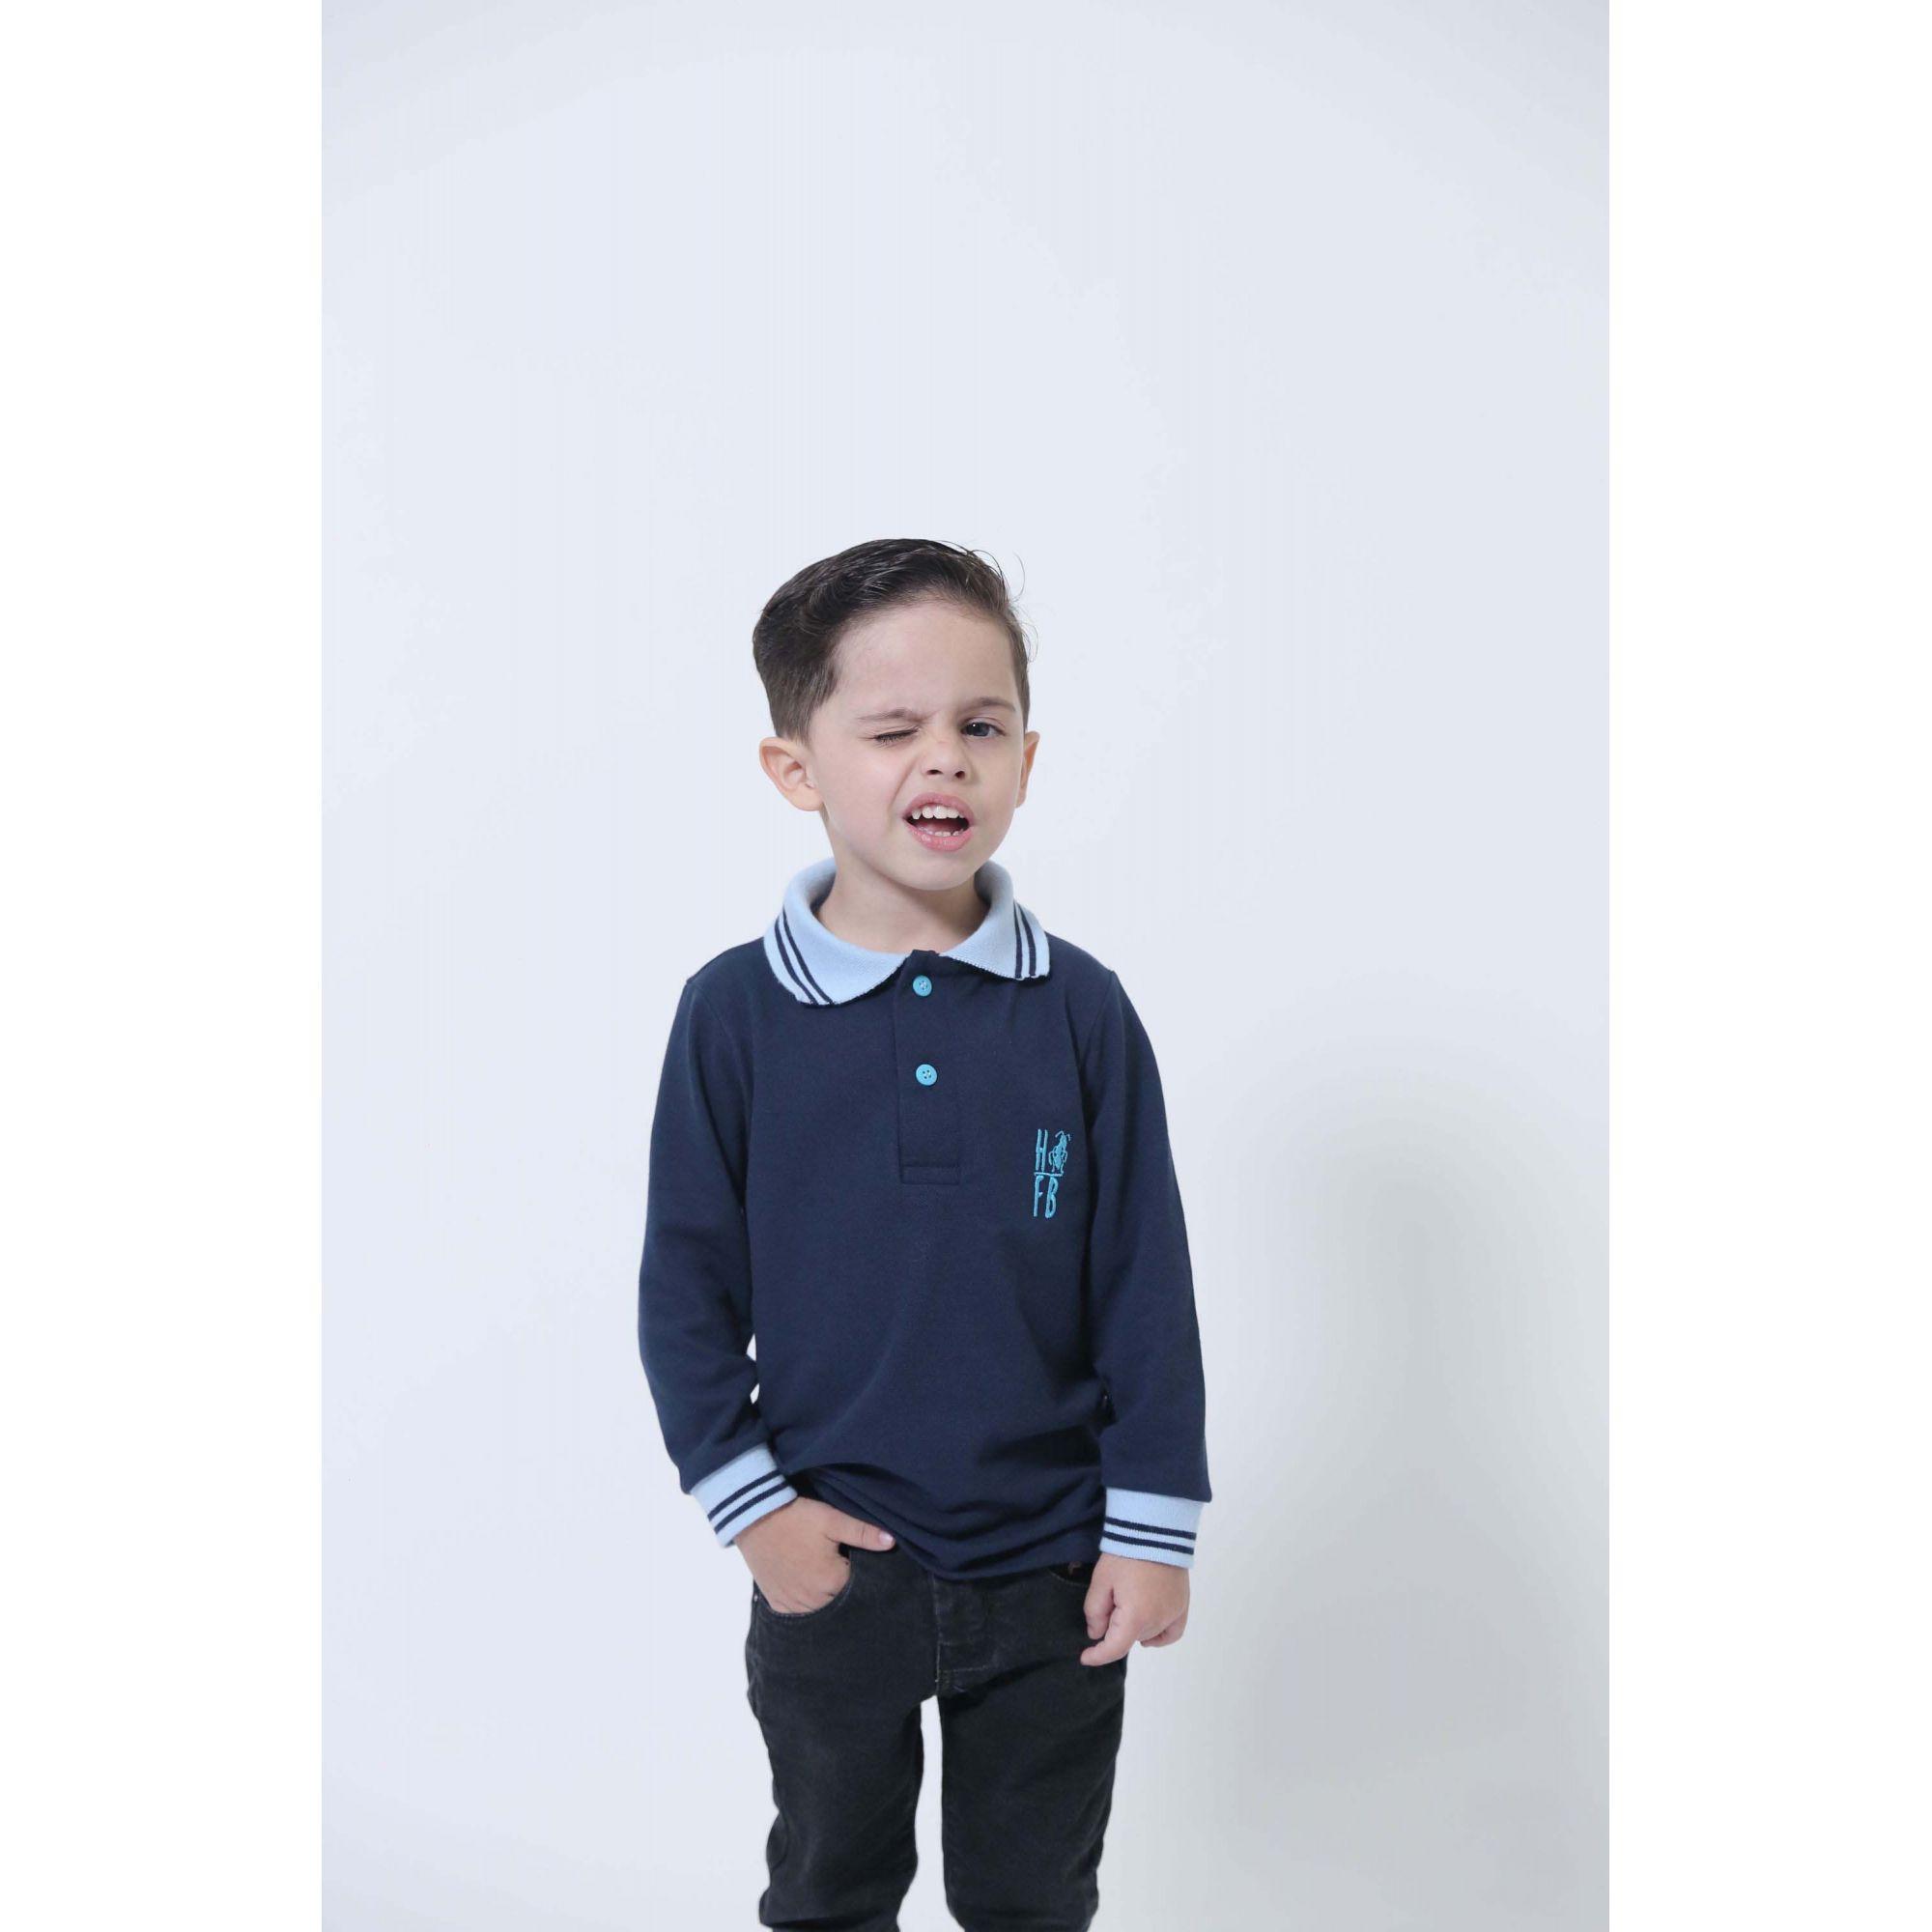 Camisa Polo ou Body Infantil Azul Manga Longa  - Heitor Fashion Brazil